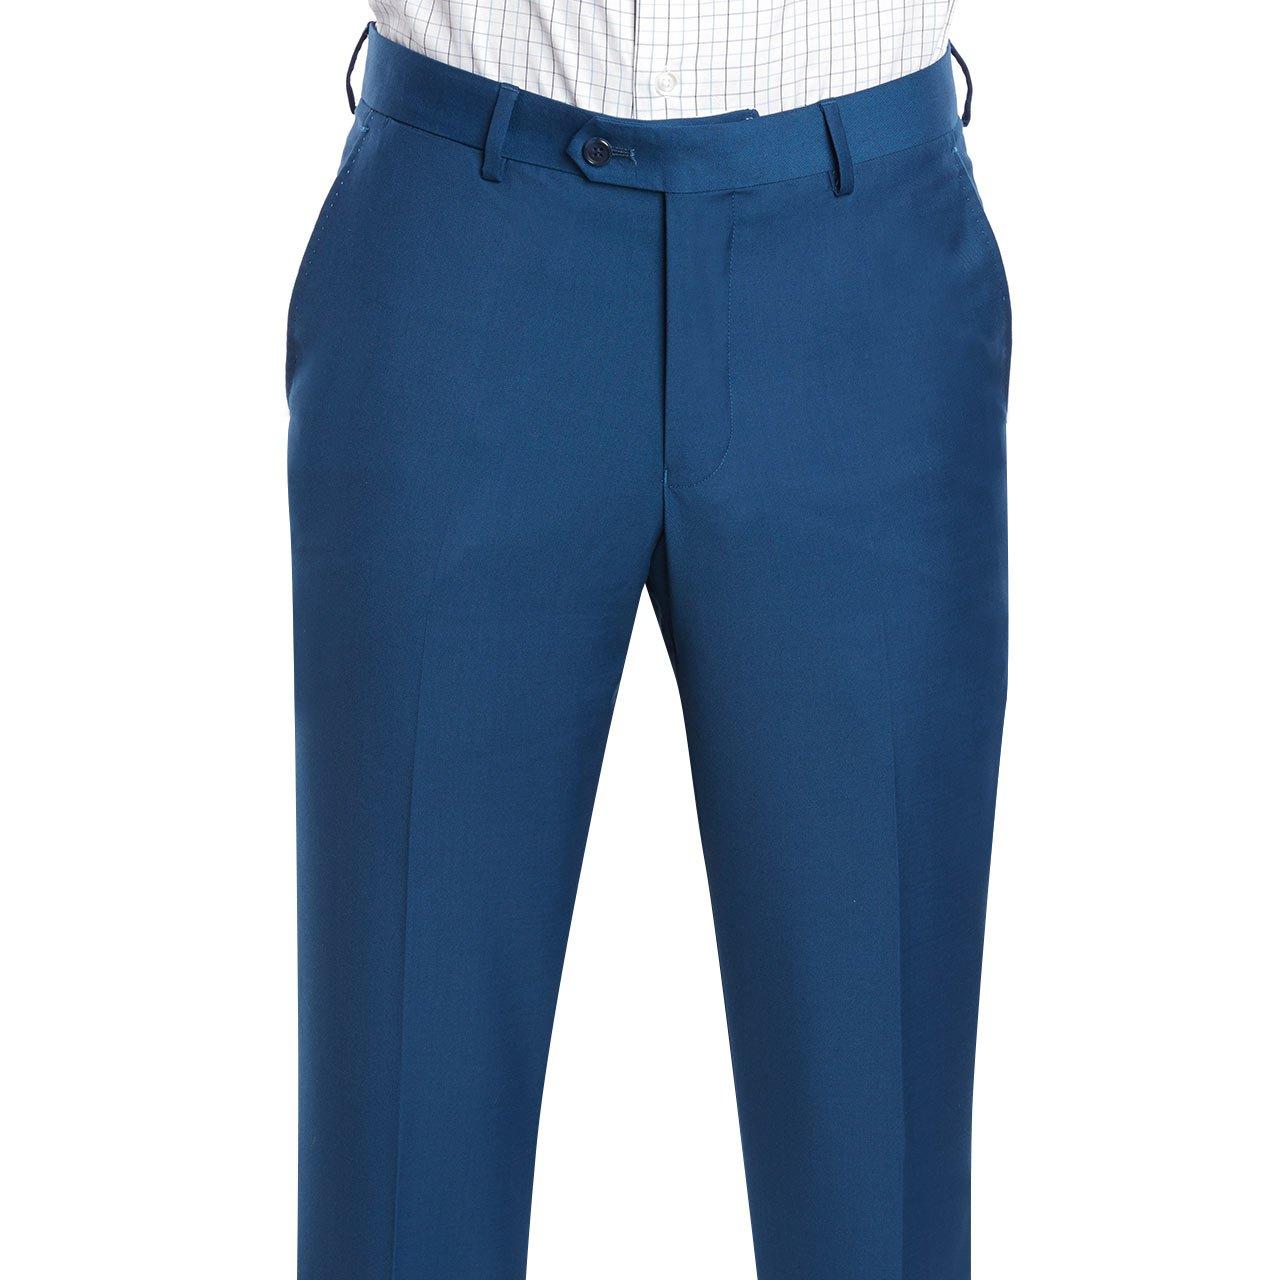 Mens Slim Fit Notched Lapel 3 Piece Suit Set Designed by Taheri French Blue 80/20(US 36R / EU 46R / Waist 30) by Sebastian Taheri Uomo (Image #4)